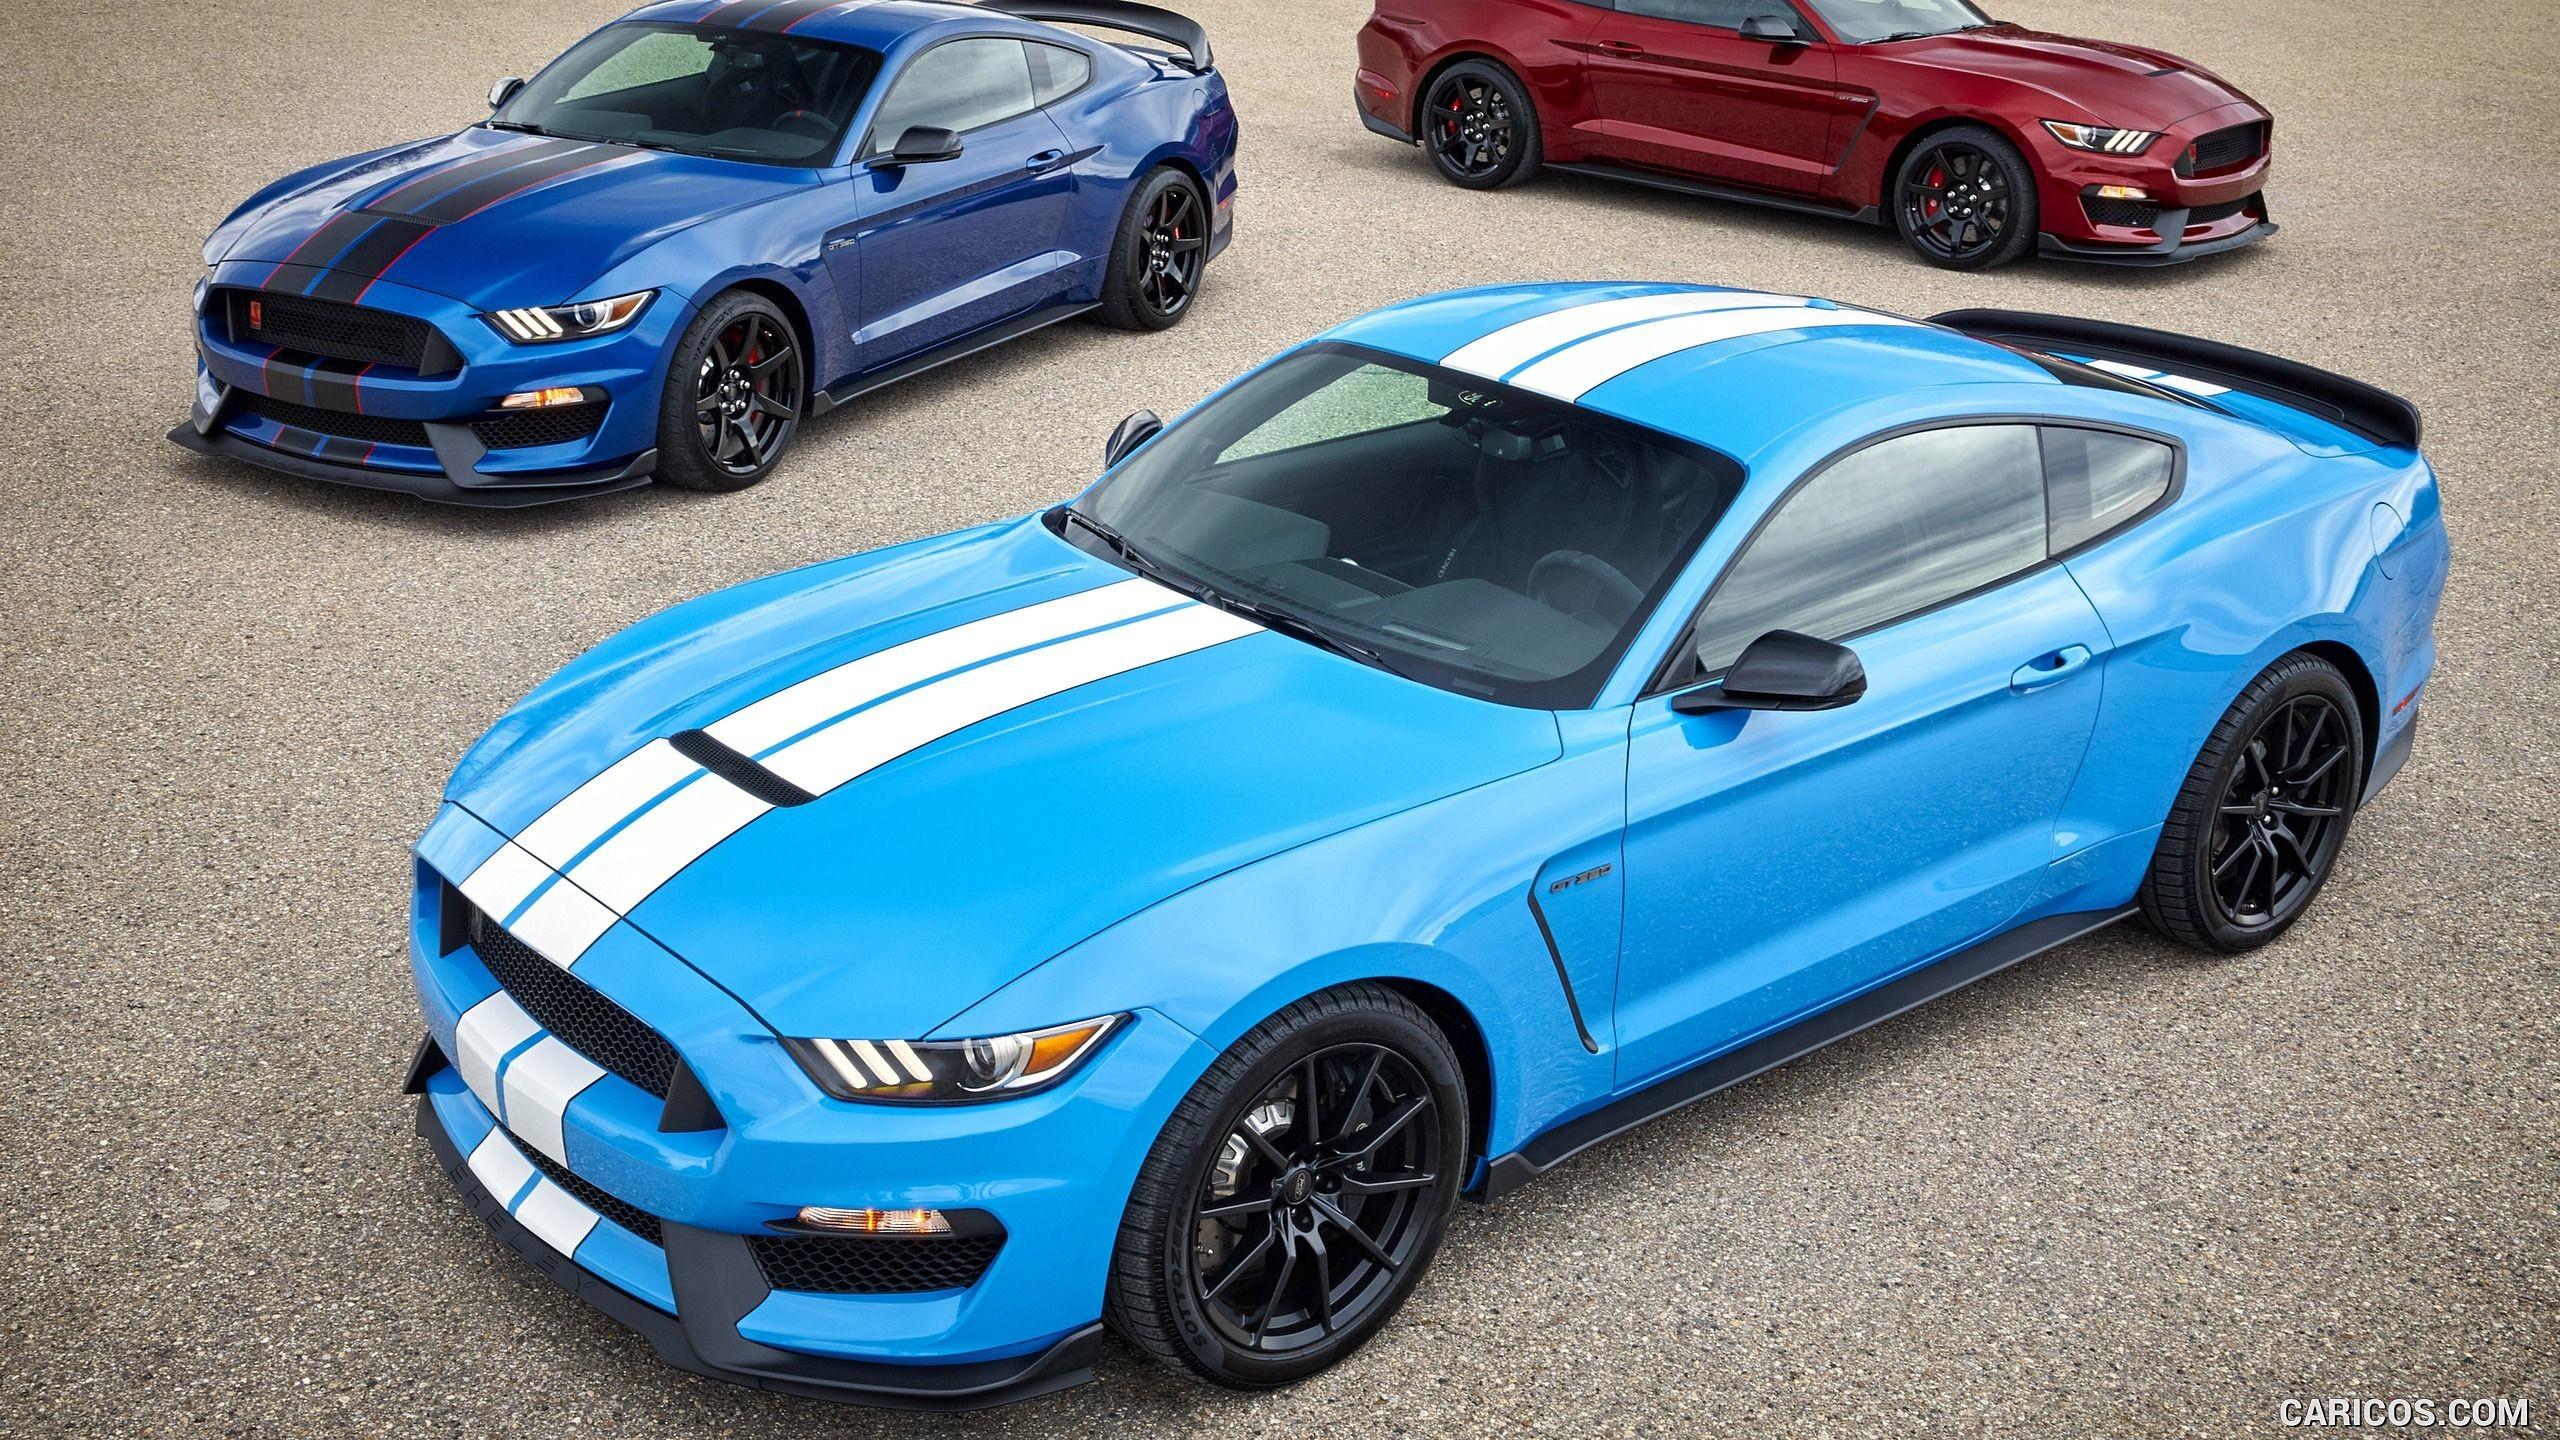 Mustang Gt350 Wallpaper 75 Images